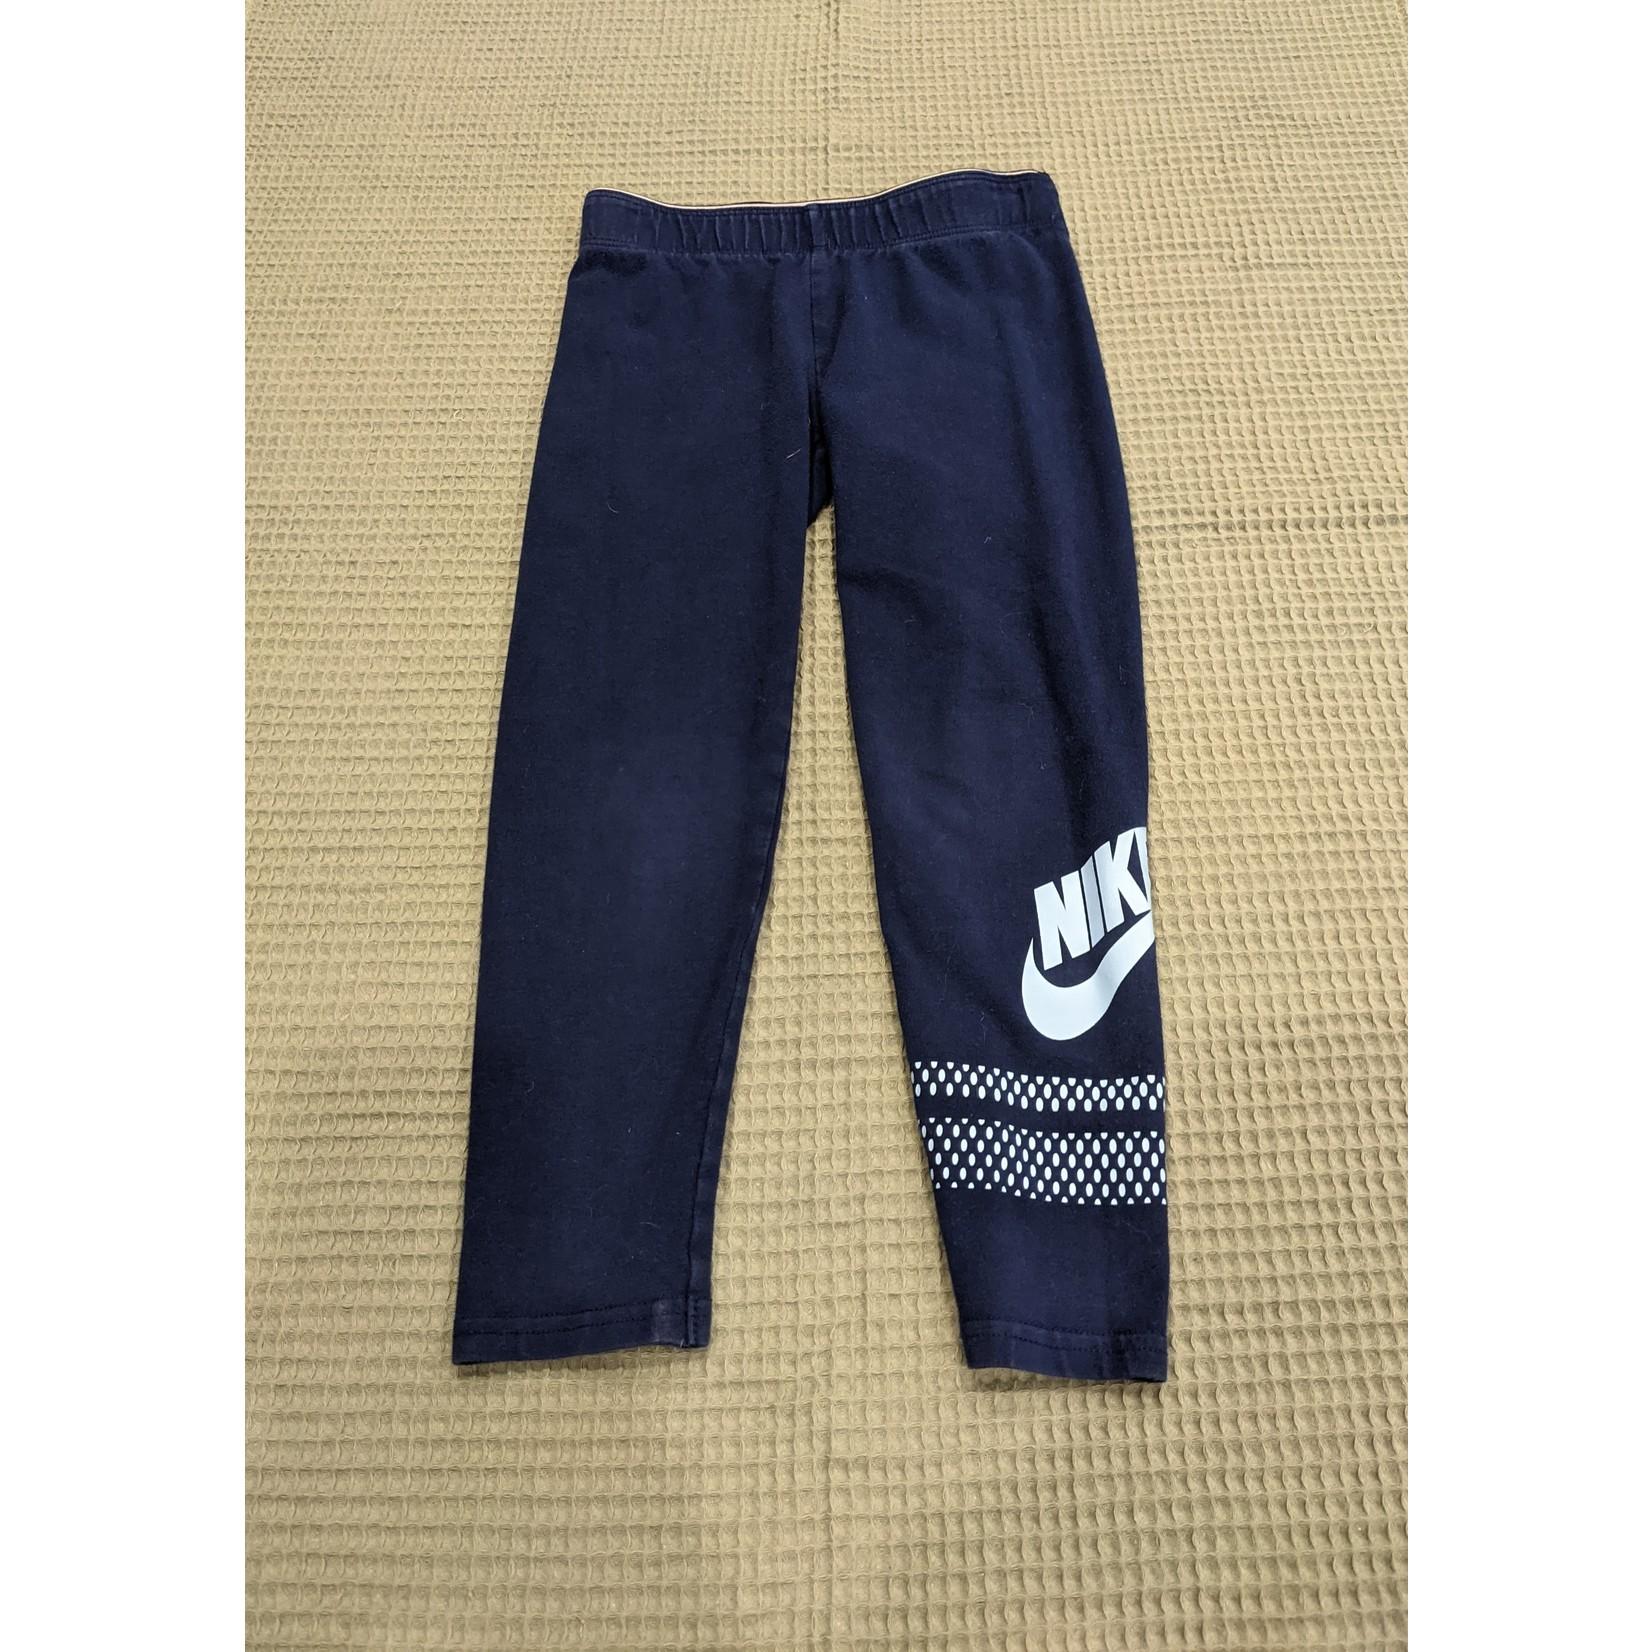 #94 Pantalon nike